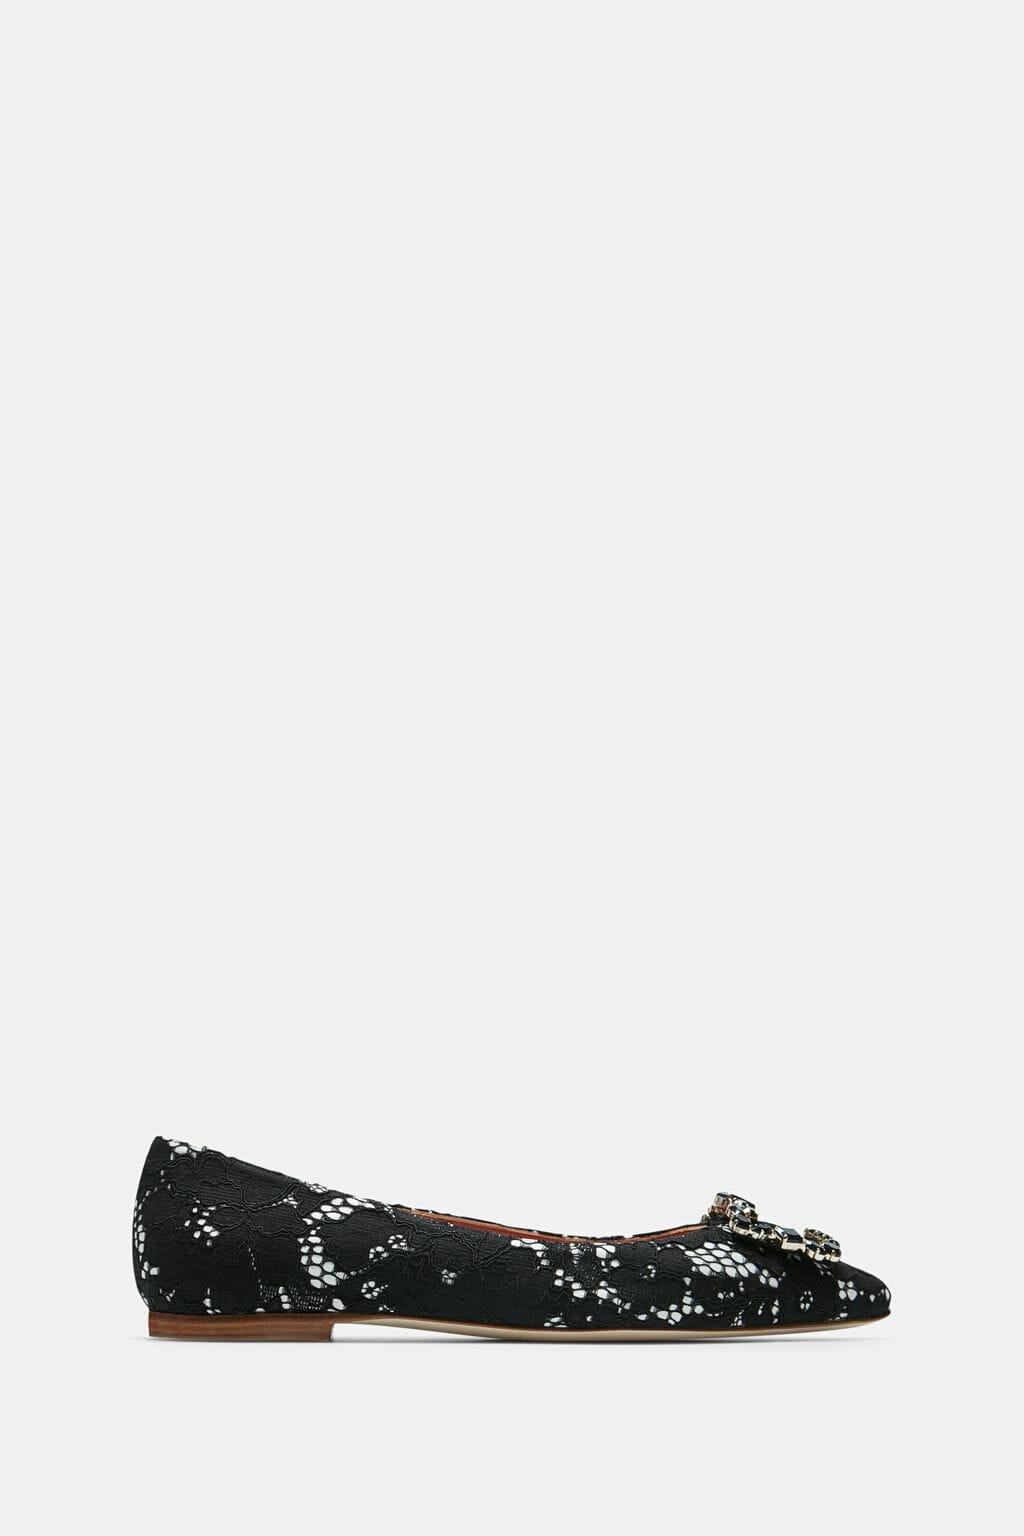 CH-Carolina-herrera-shoes-collection-Spring-Summer-2018-shoe-32